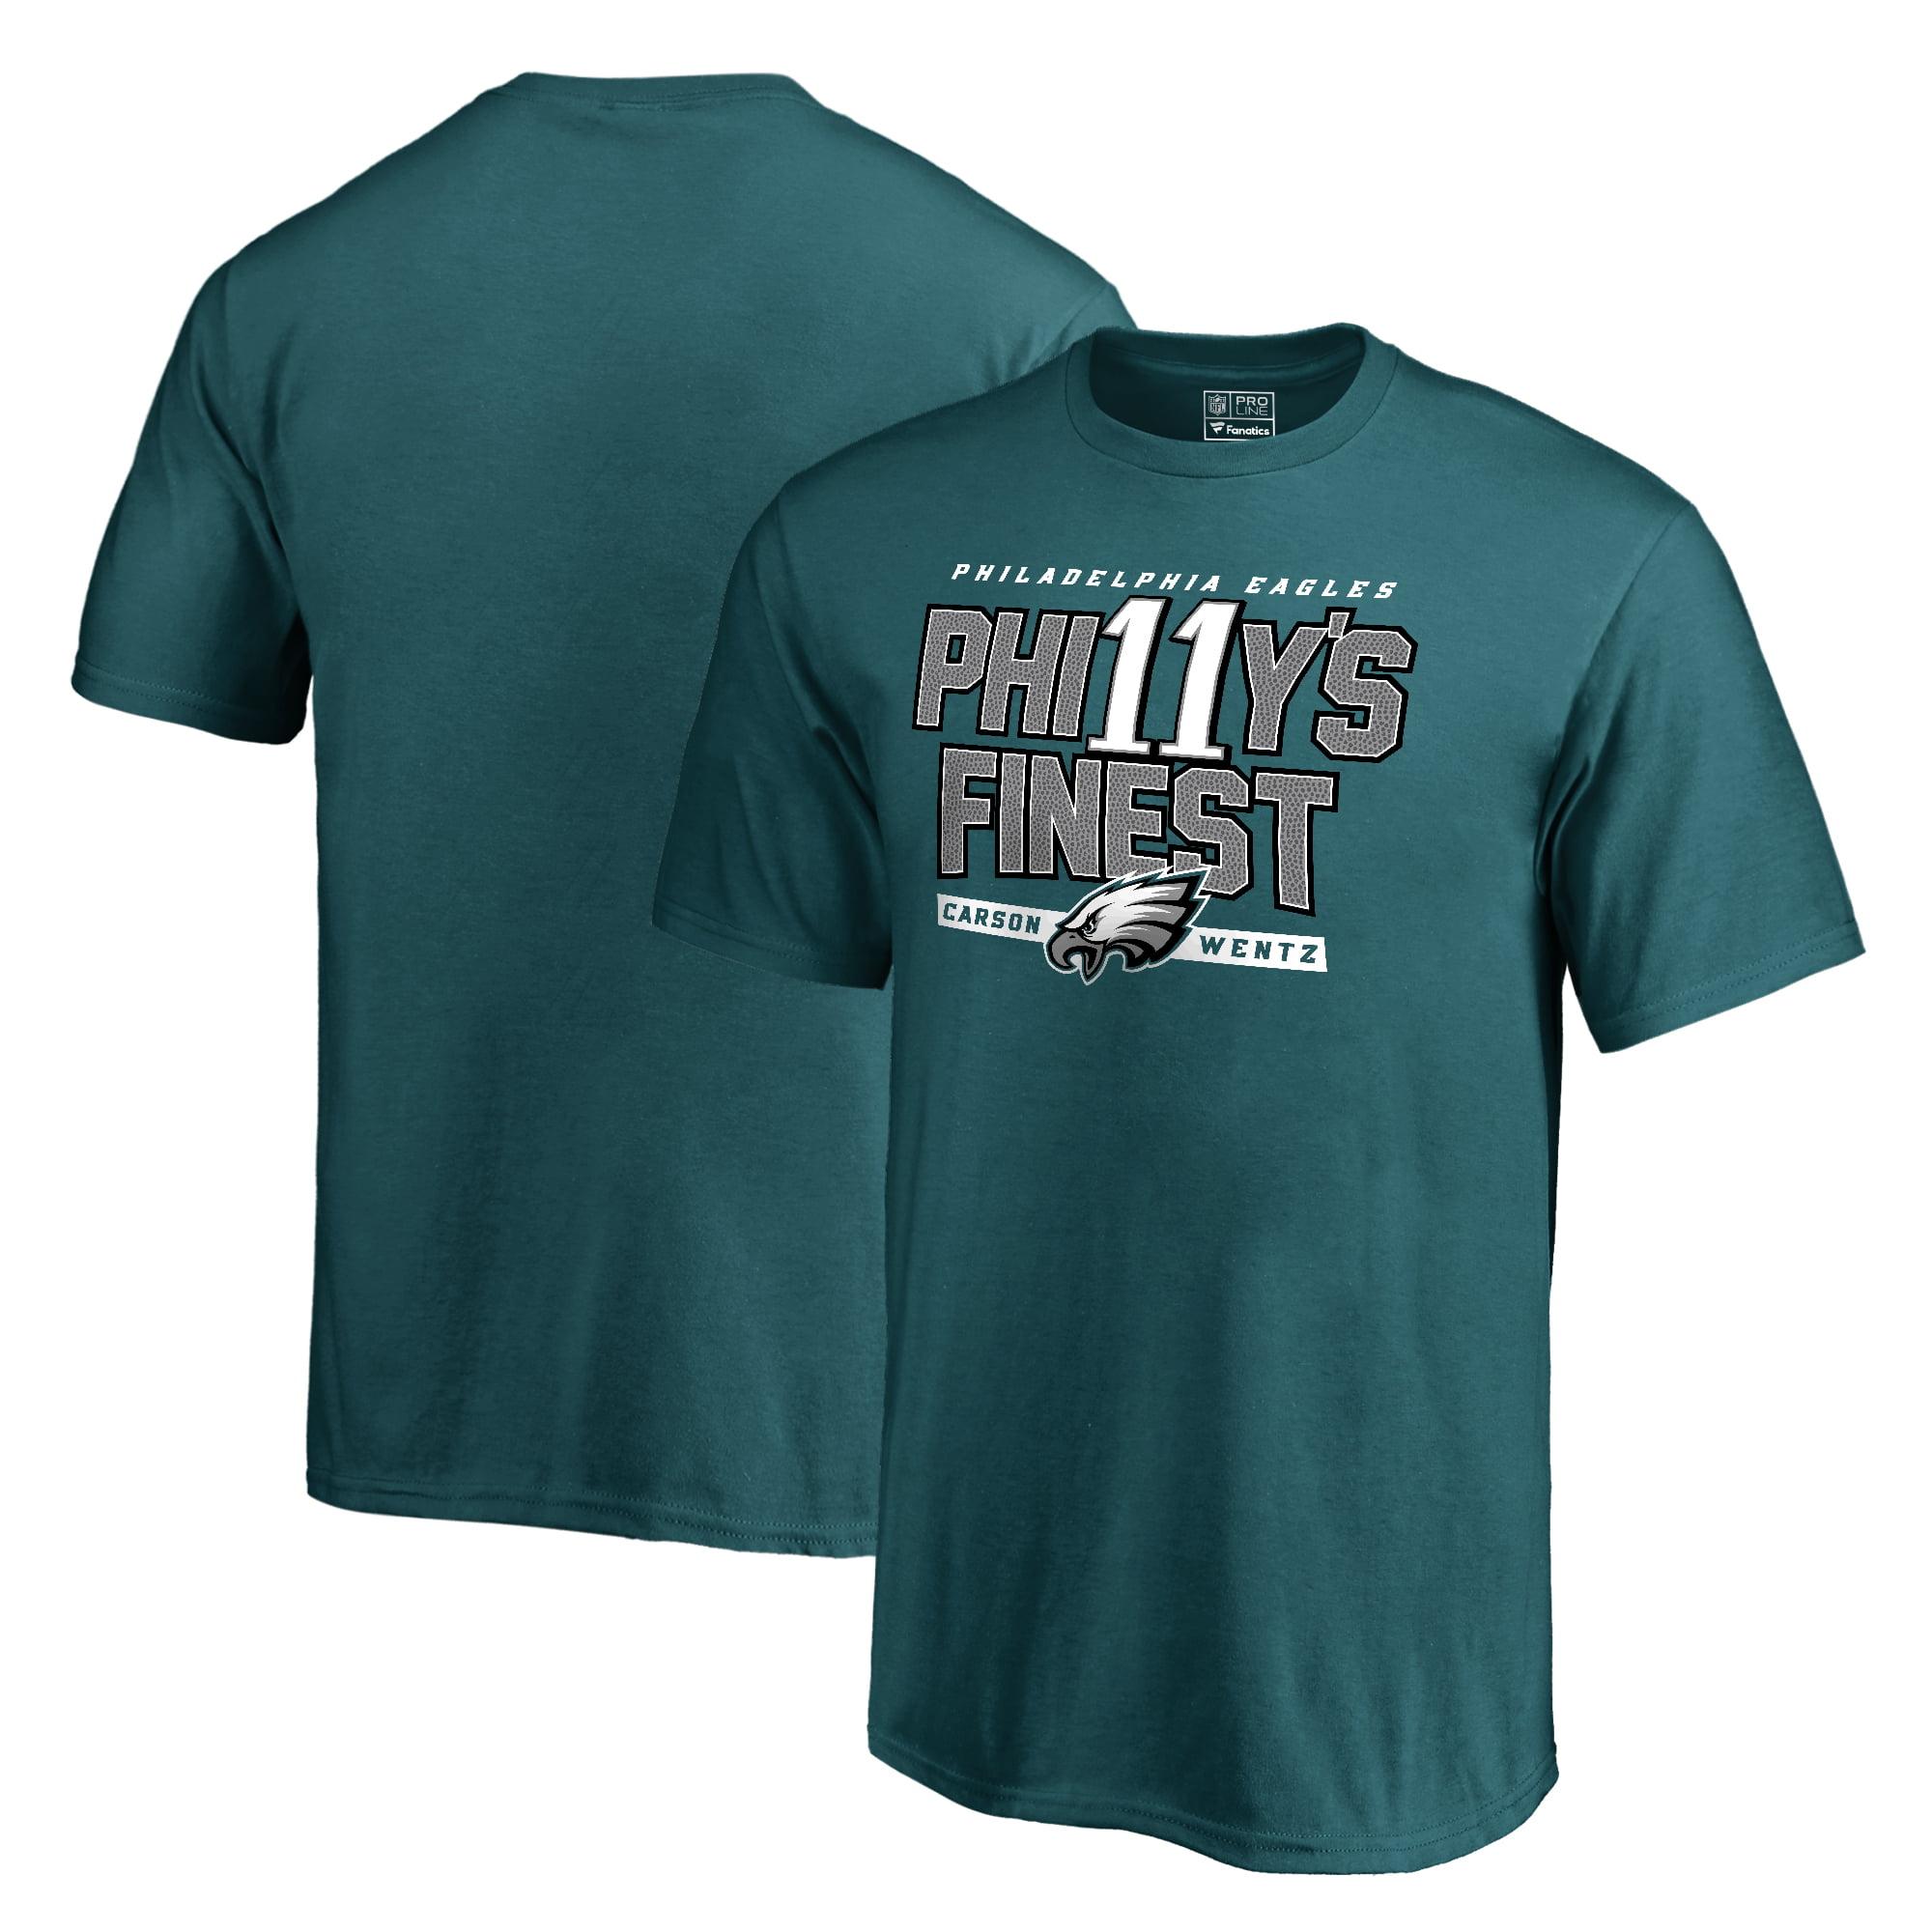 Carson Wentz Philadelphia Eagles Youth NFL Pro Line Philly's Finest T-Shirt - Green